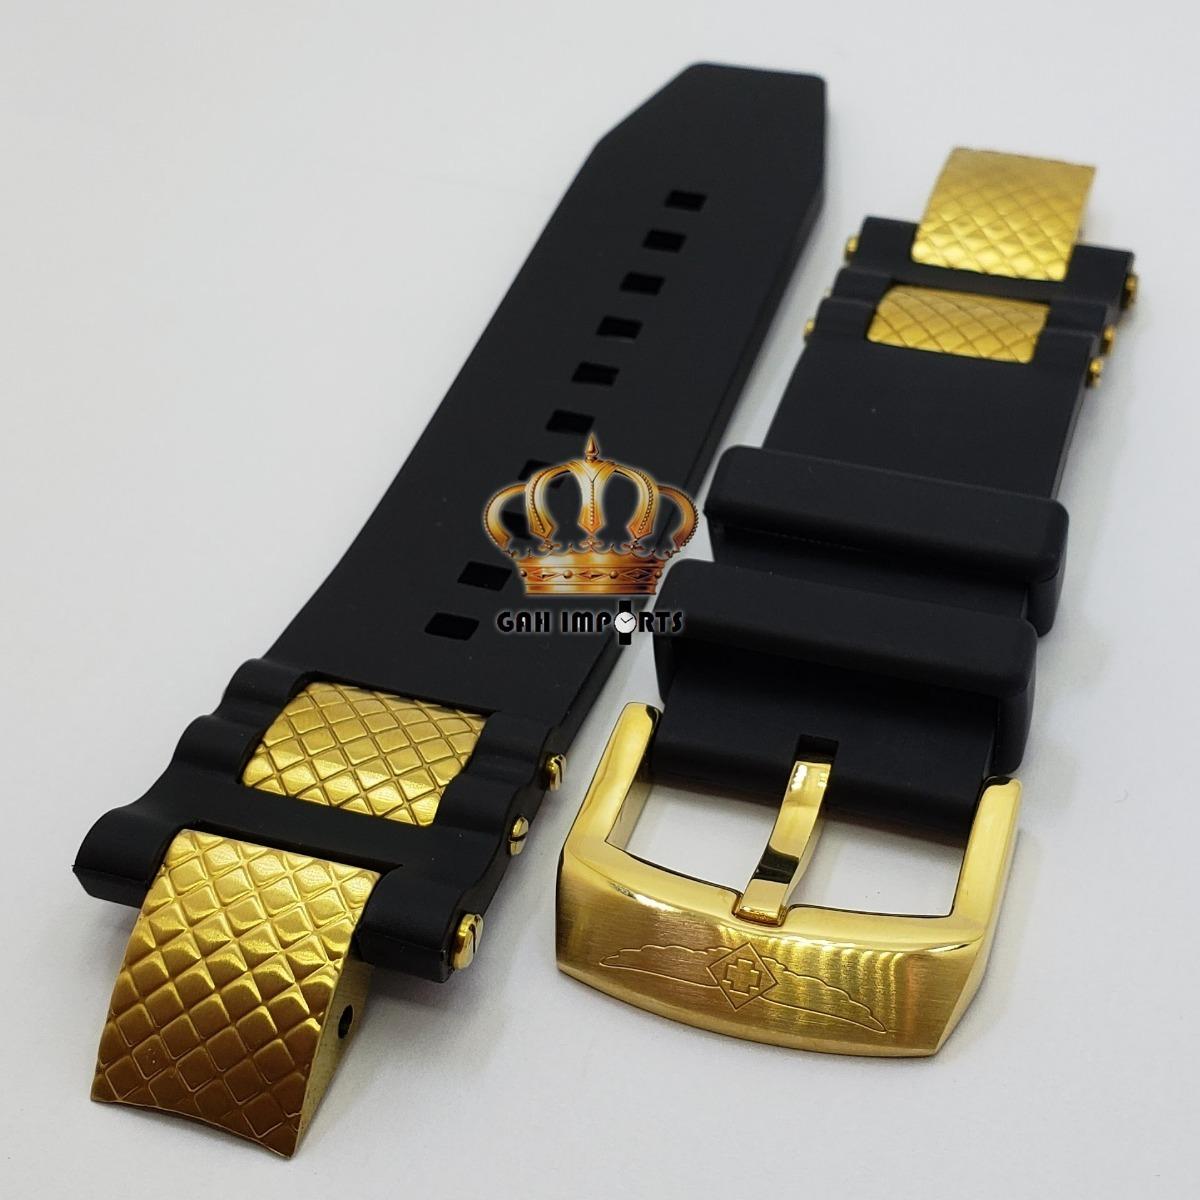 bca2d85f1d4 pulseira invicta subaqua noma 3 iii completa dourada. Carregando zoom.